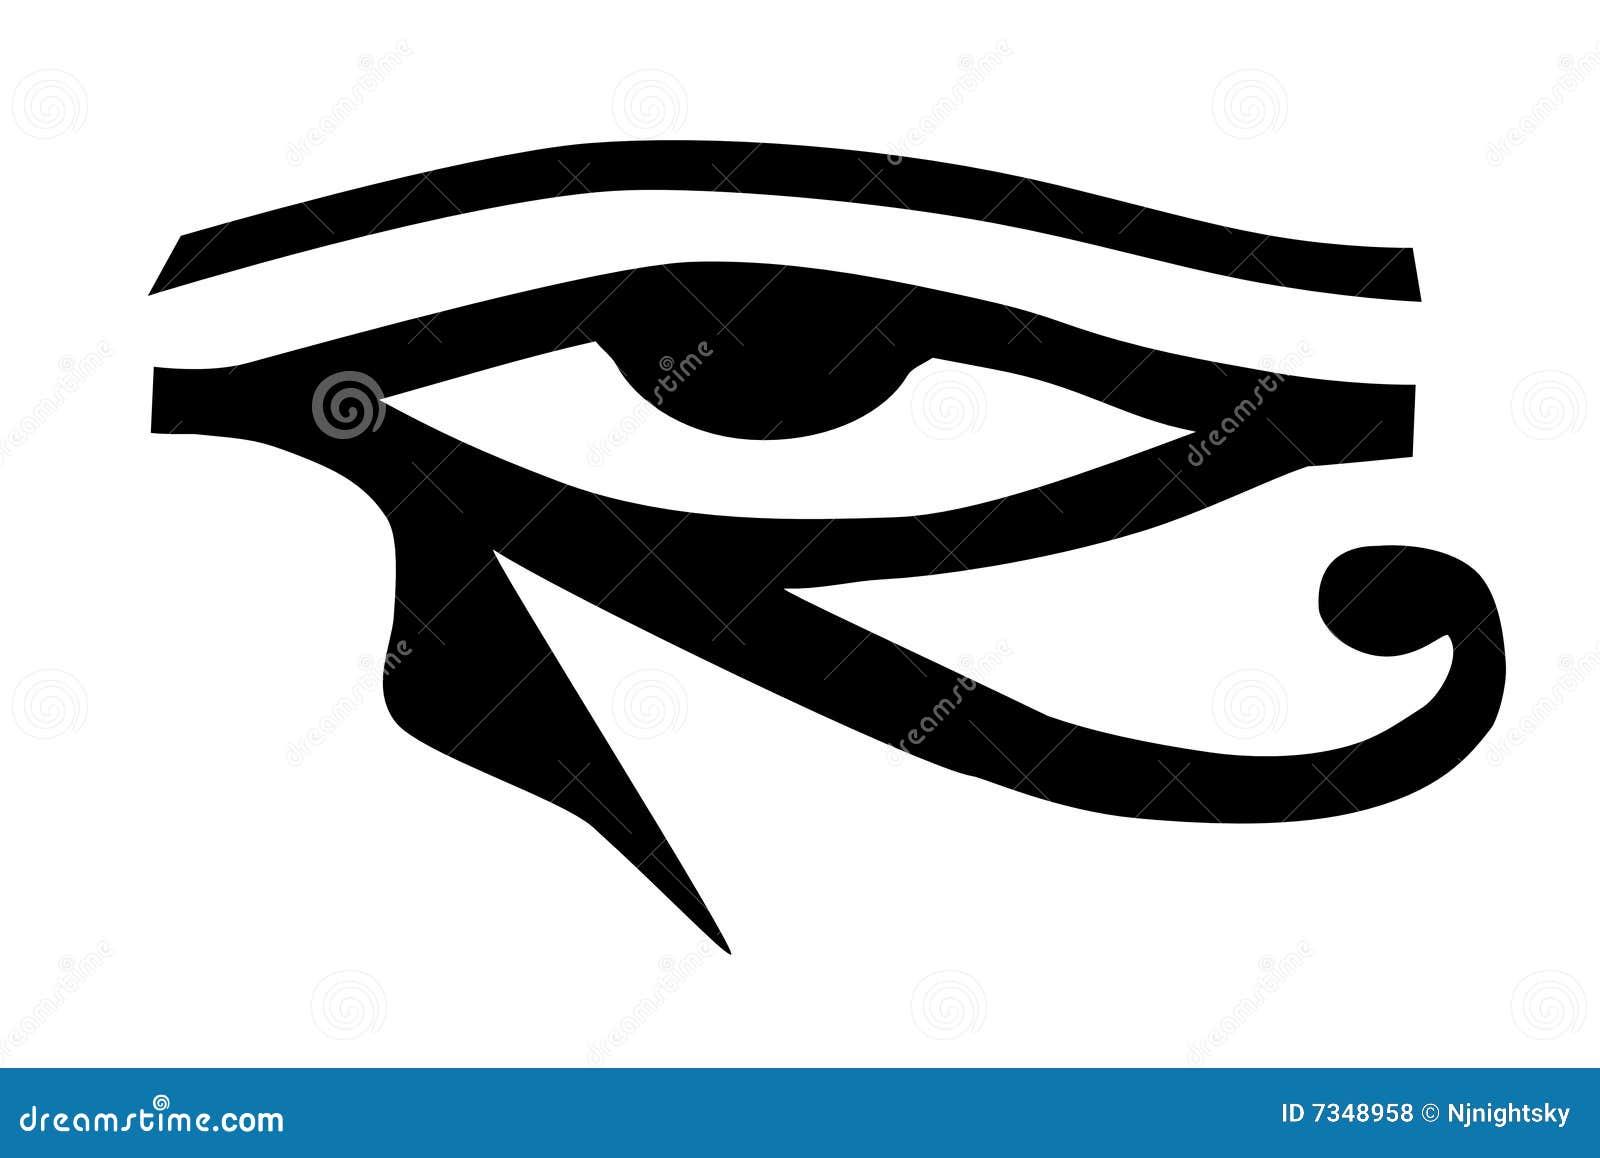 Eye Horus Tattoo Stock Illustrations 106 Eye Horus Tattoo Stock